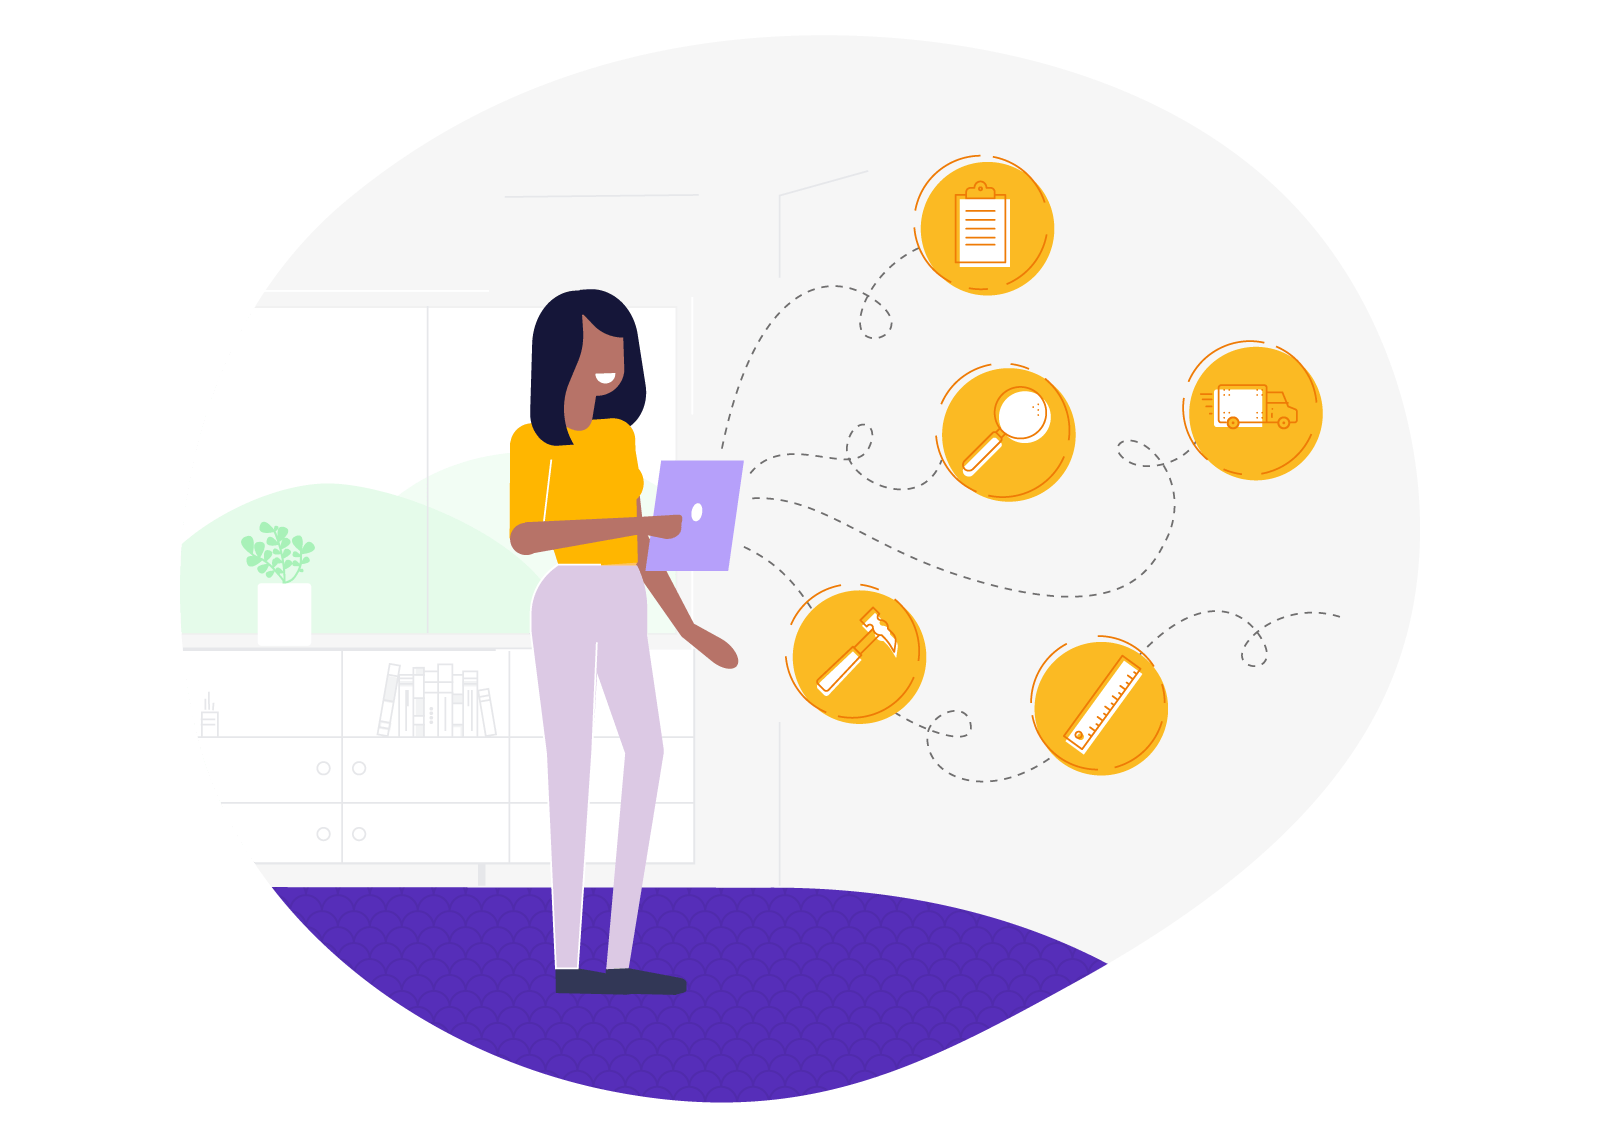 Product Management illustration